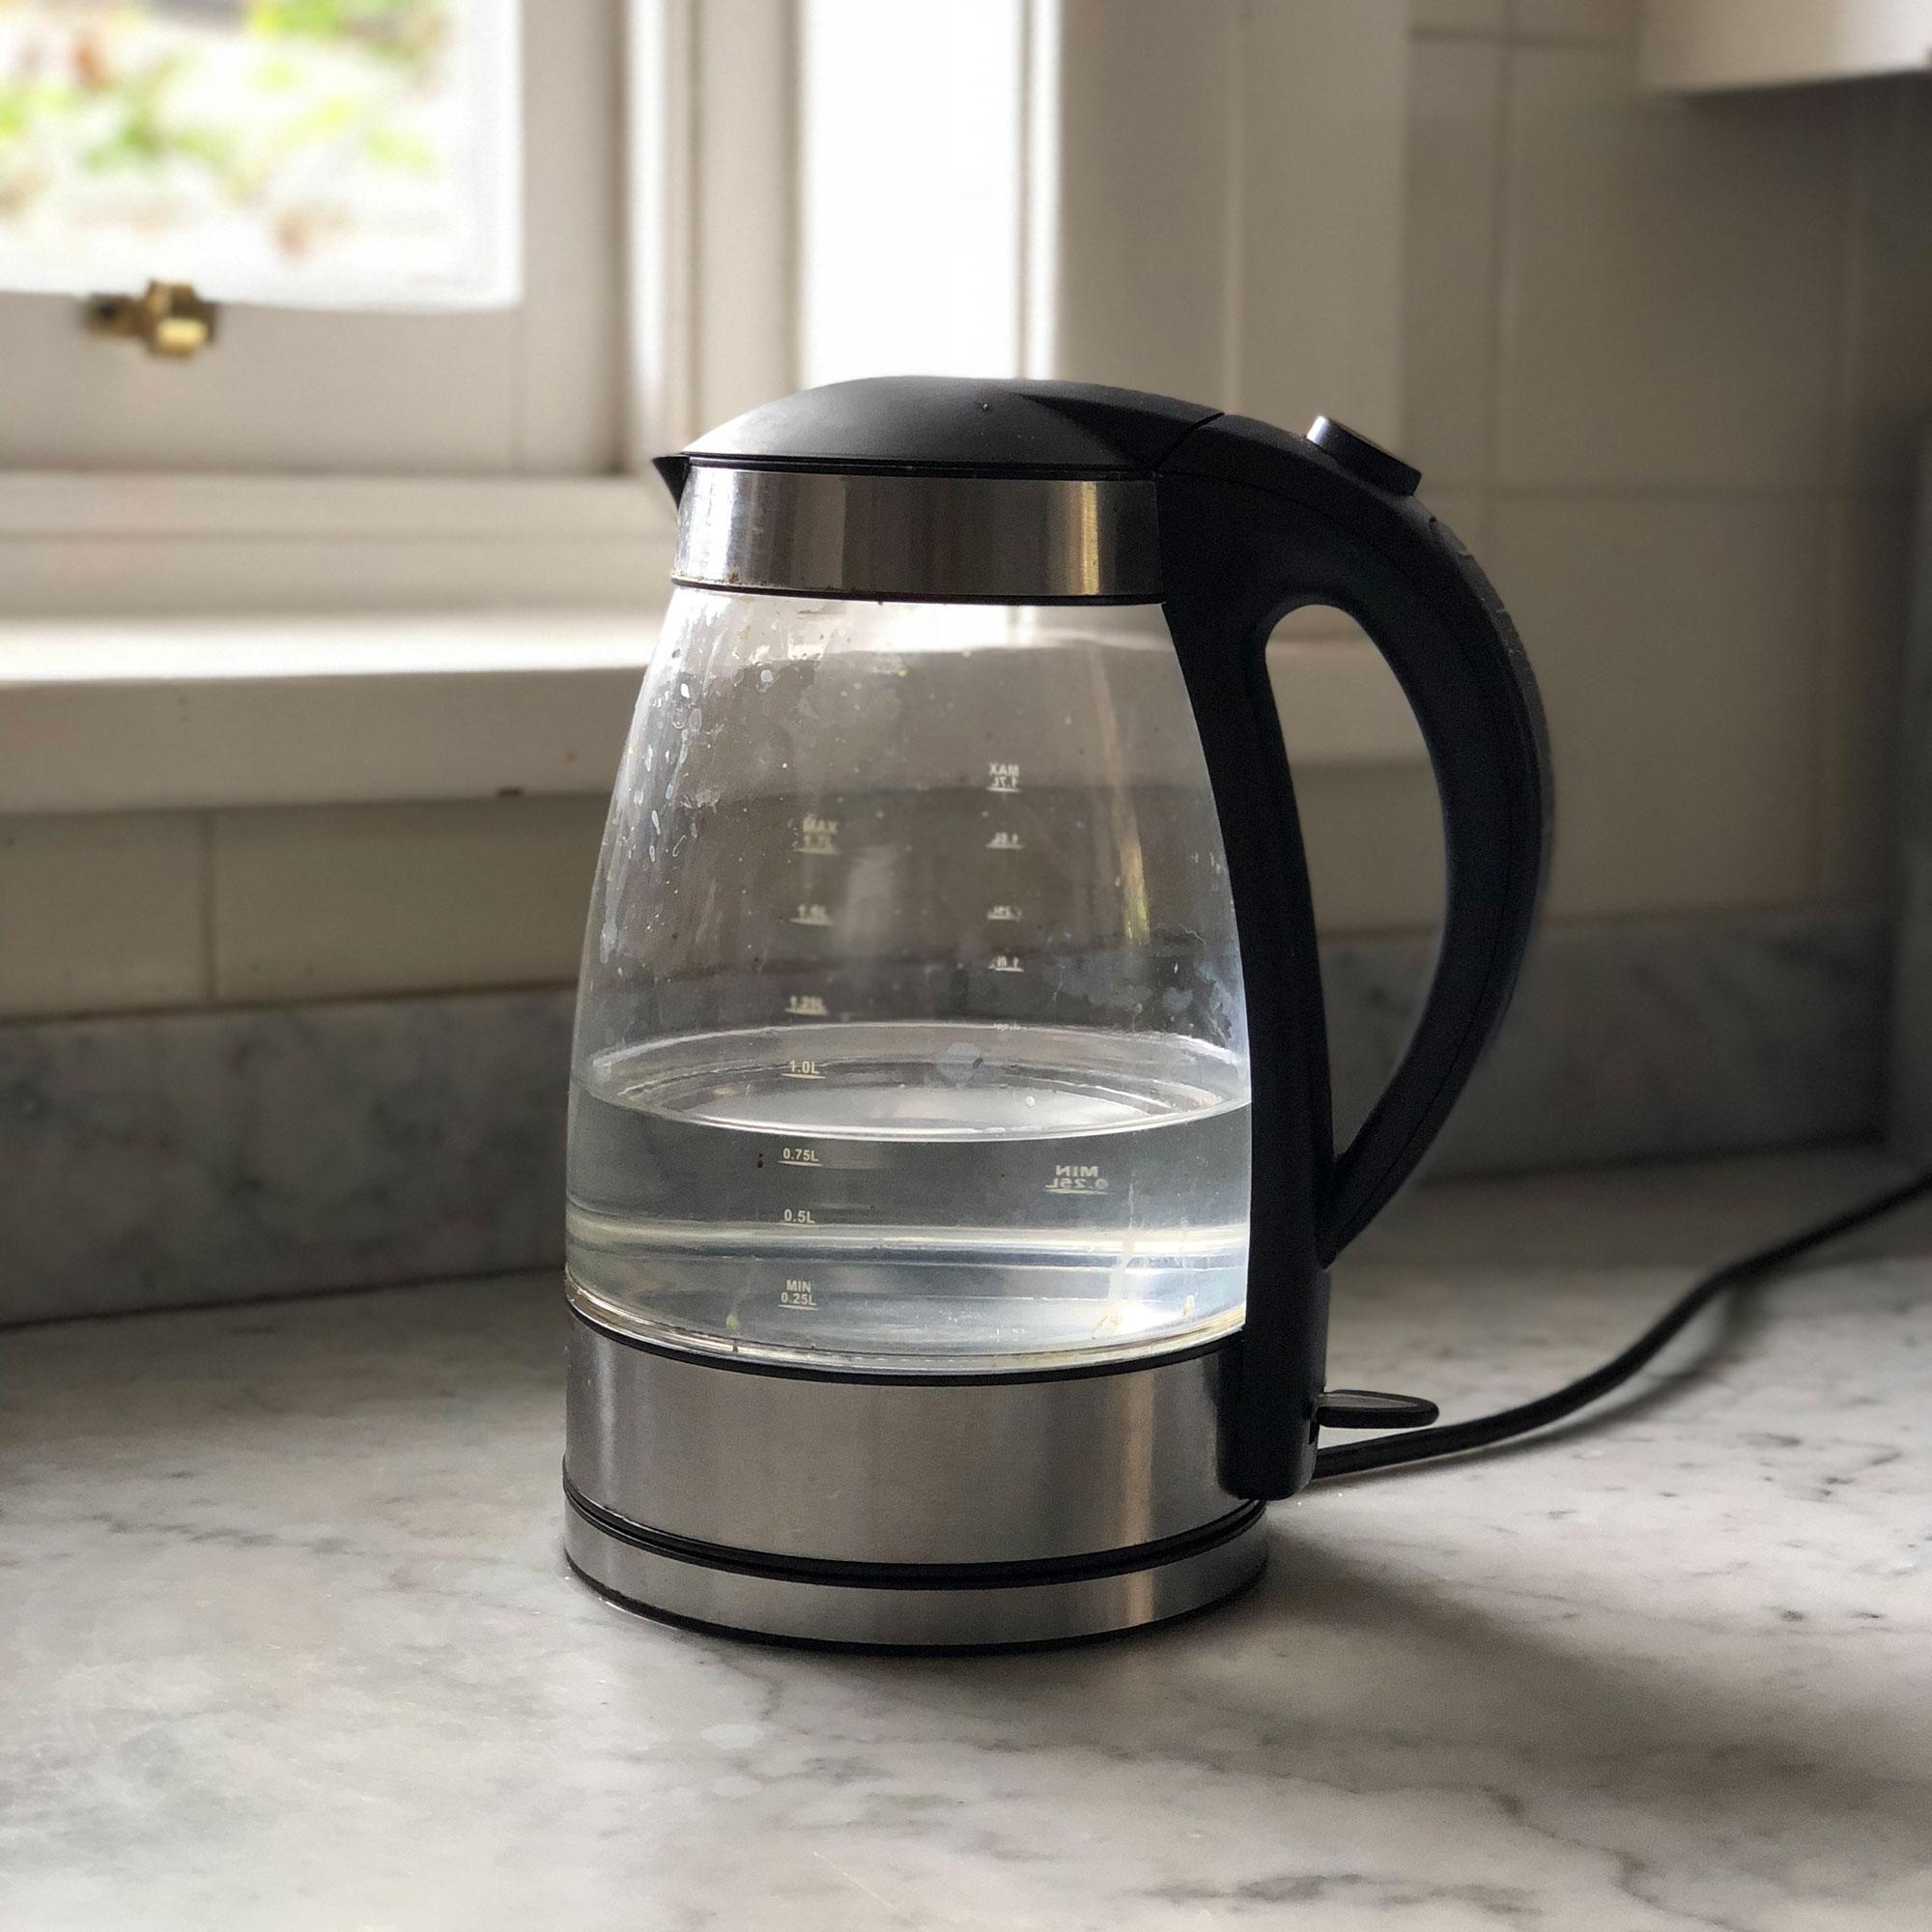 clean clear glass kettle